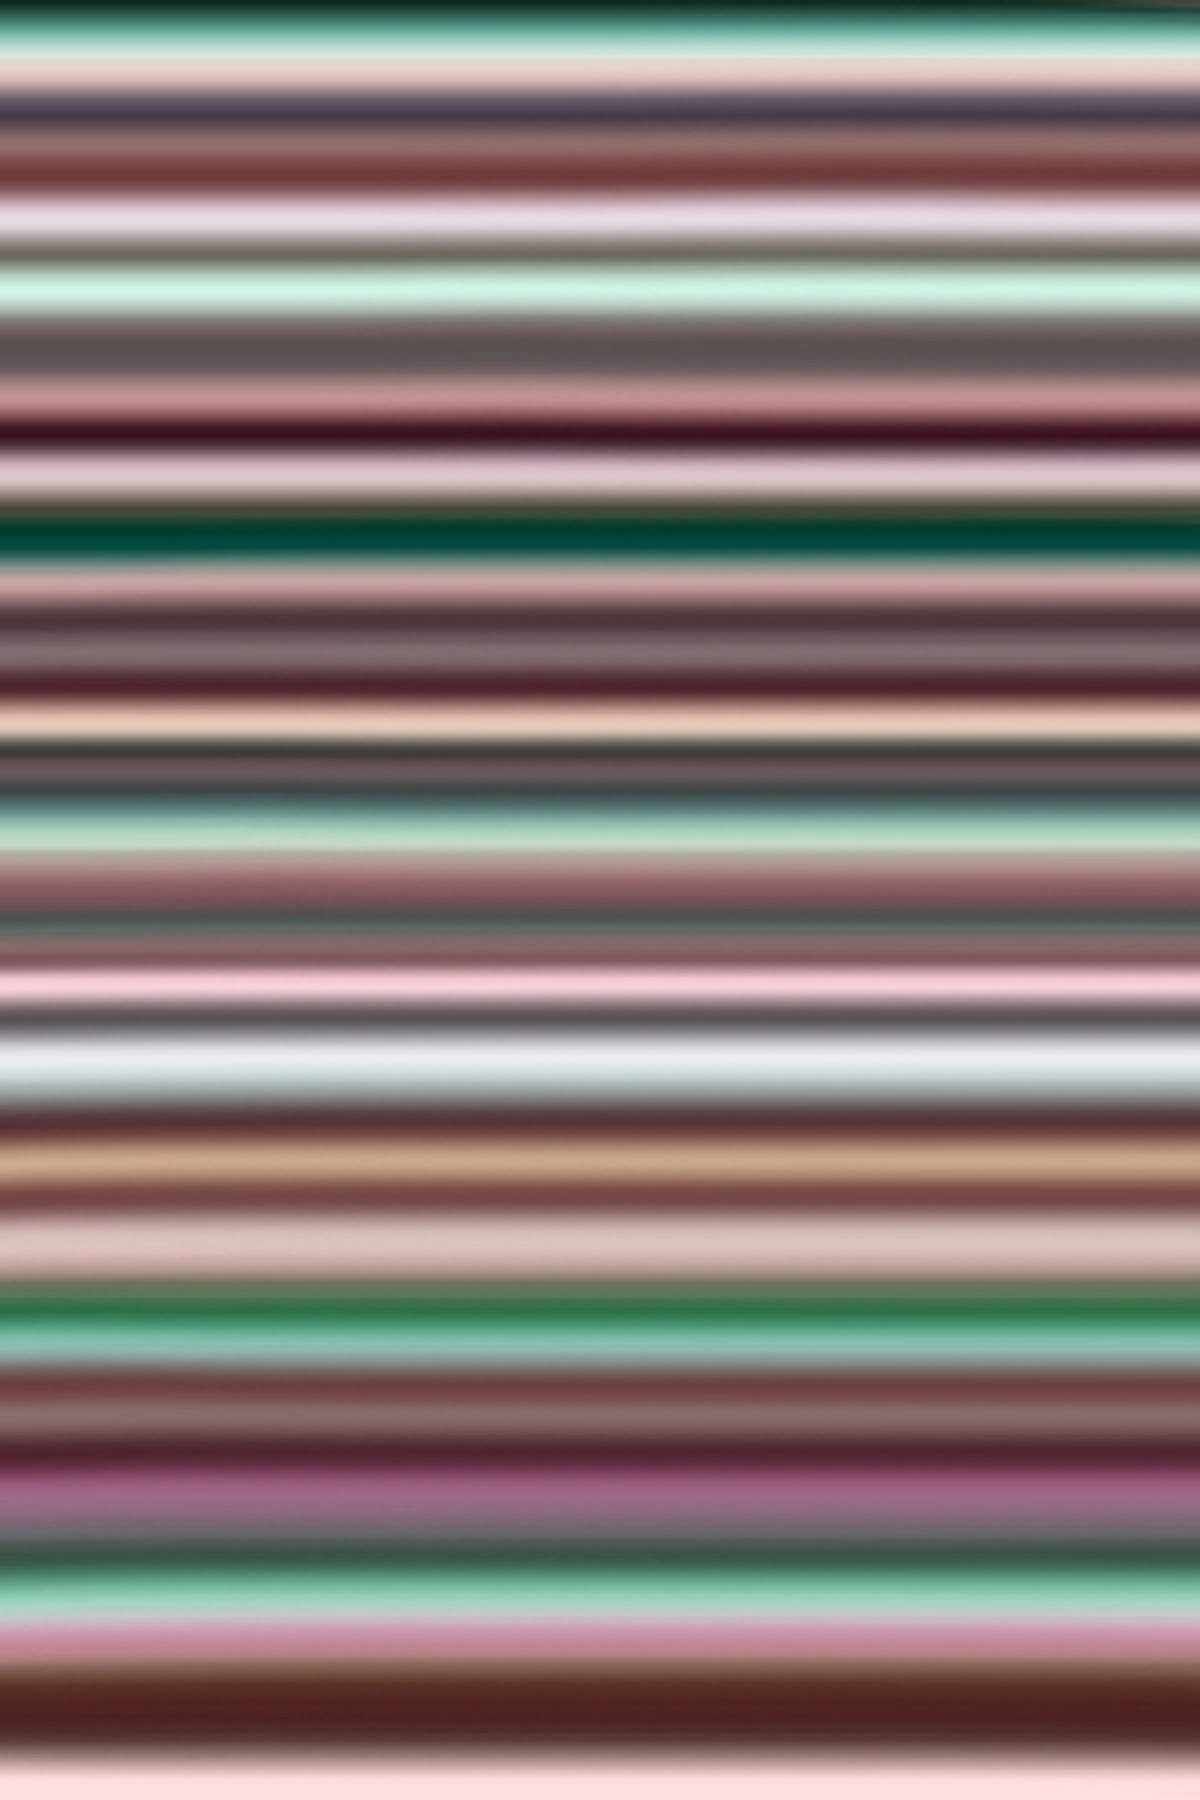 Walking Lines 7 by Vishwanath Mishra, Digital Digital Art, Digital Print on Canvas, Brown color